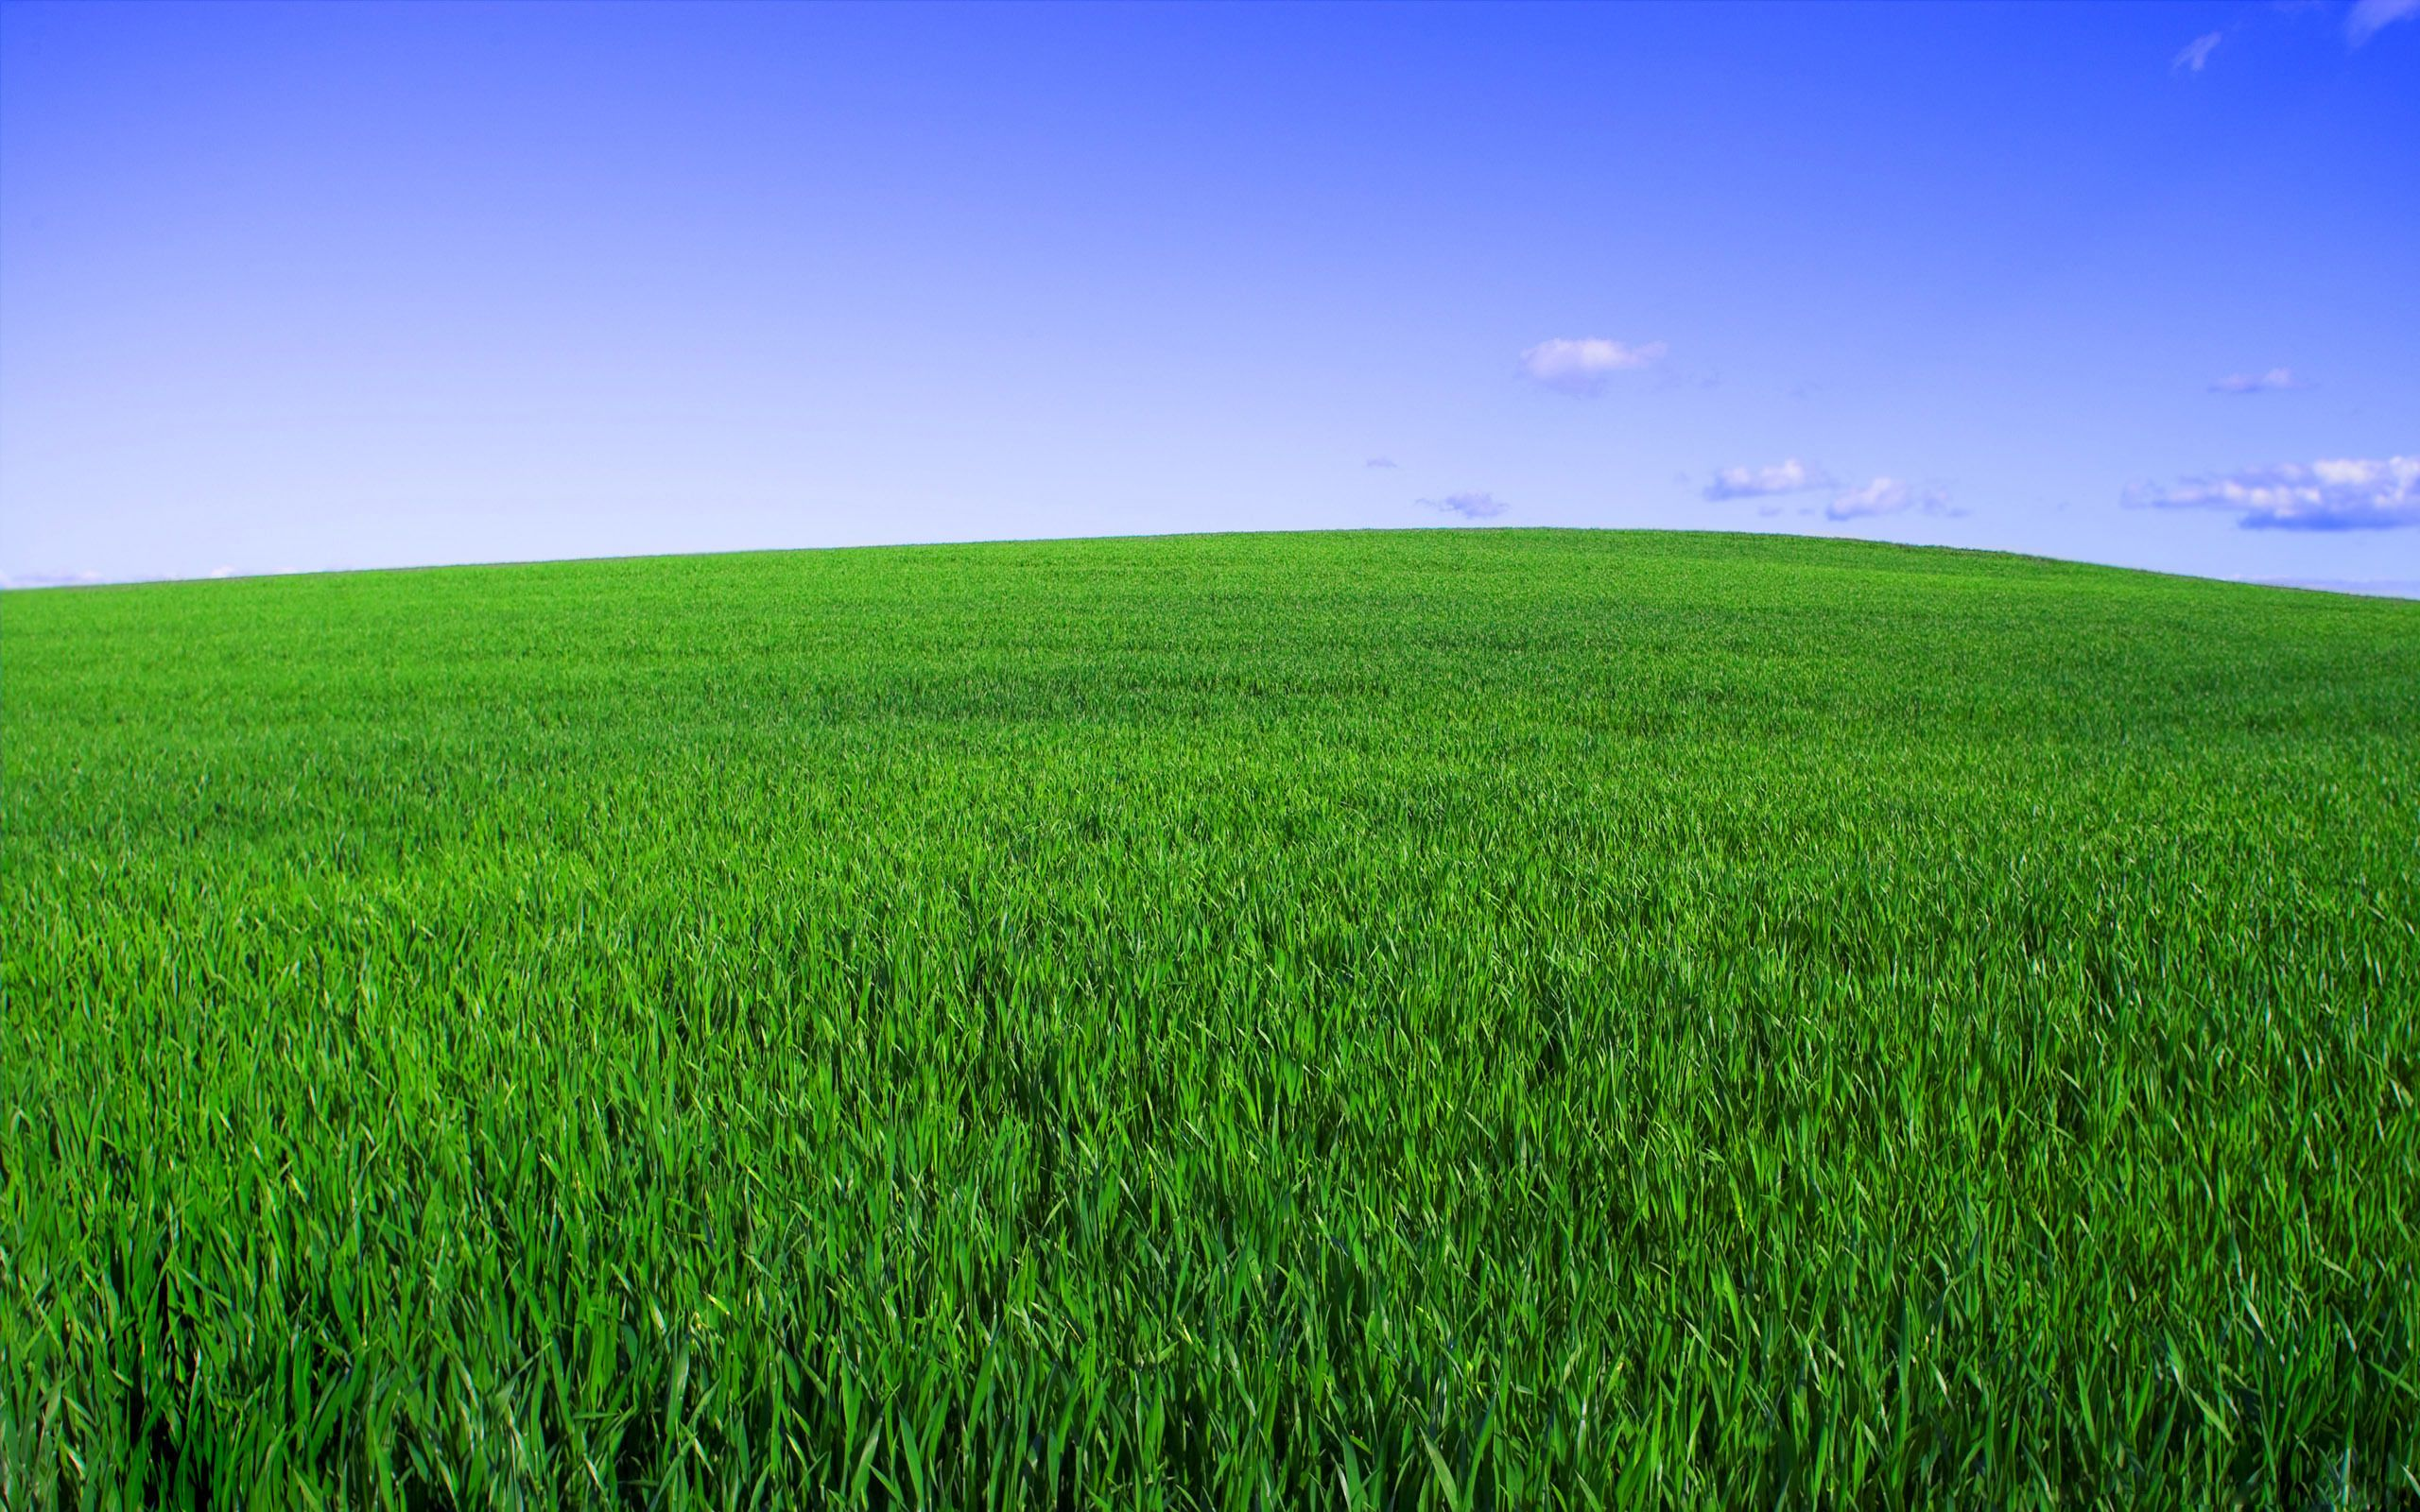 Hitman Grass Field Green Sky Horizon Landscapes 2560x1600 ...